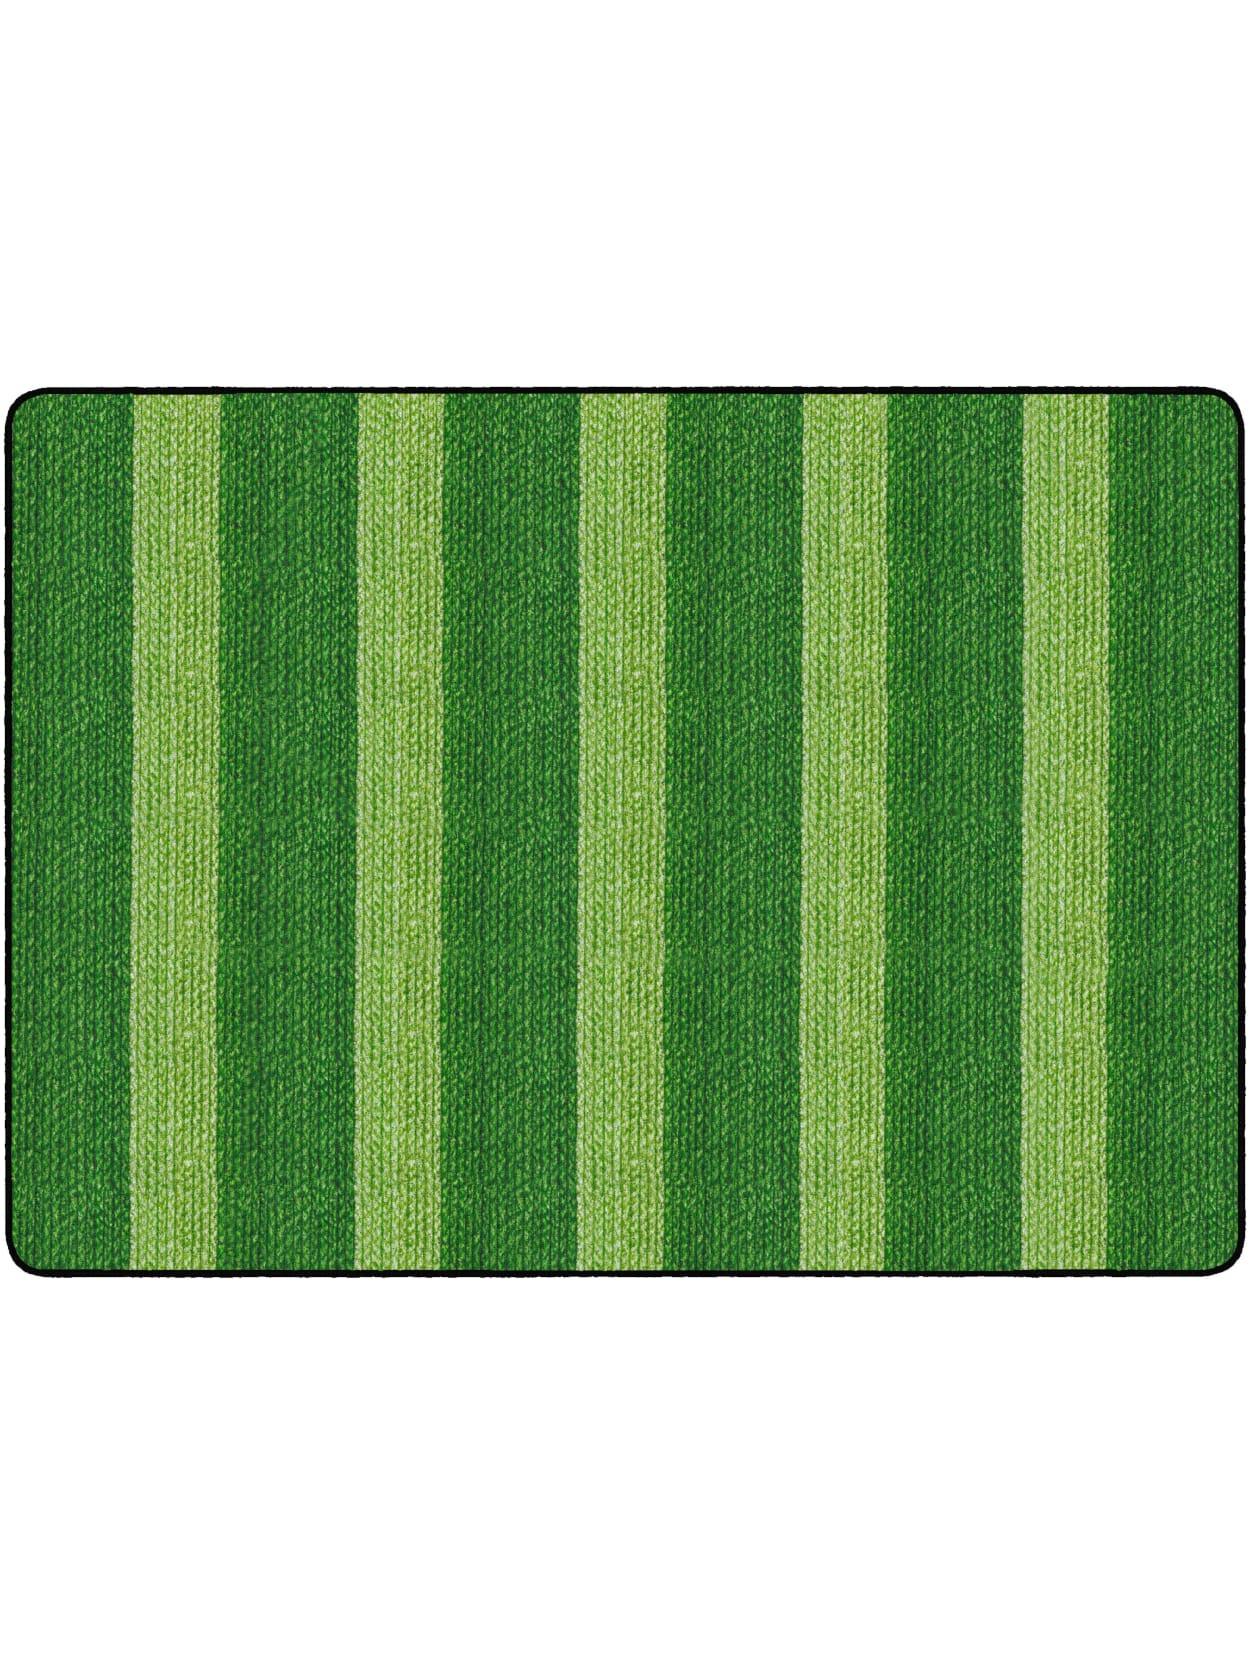 Flagship Carpets Basketweave Stripes Classroom Rug 6 X 8 38 Green Office Depot